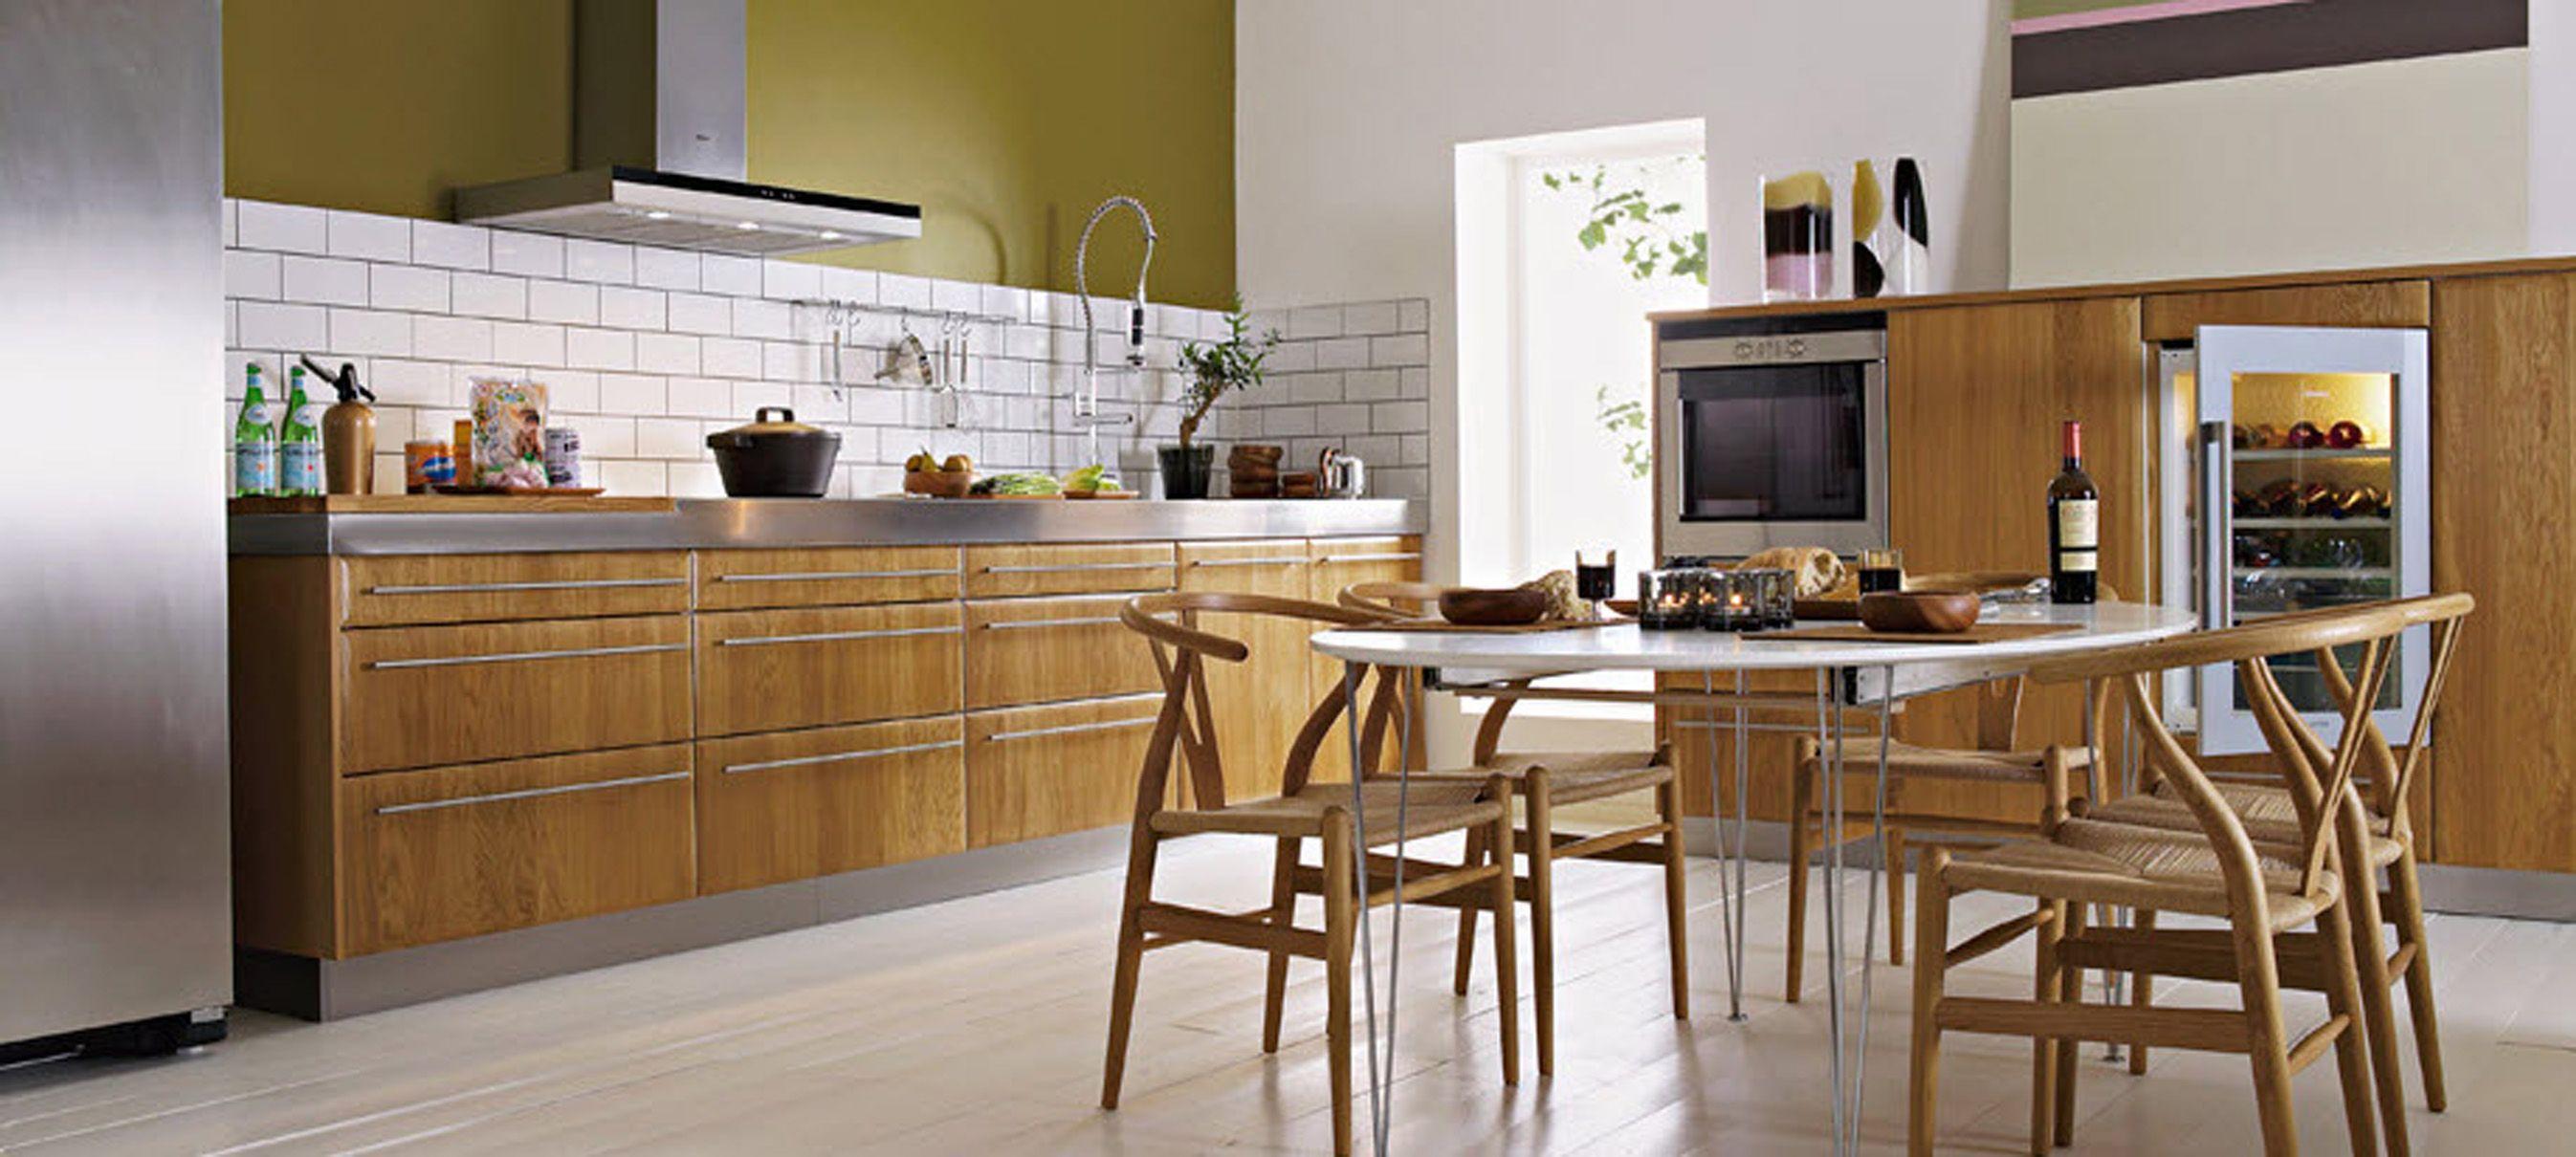 kitchen desk design ideas large kitchen design ideas cape cod ...